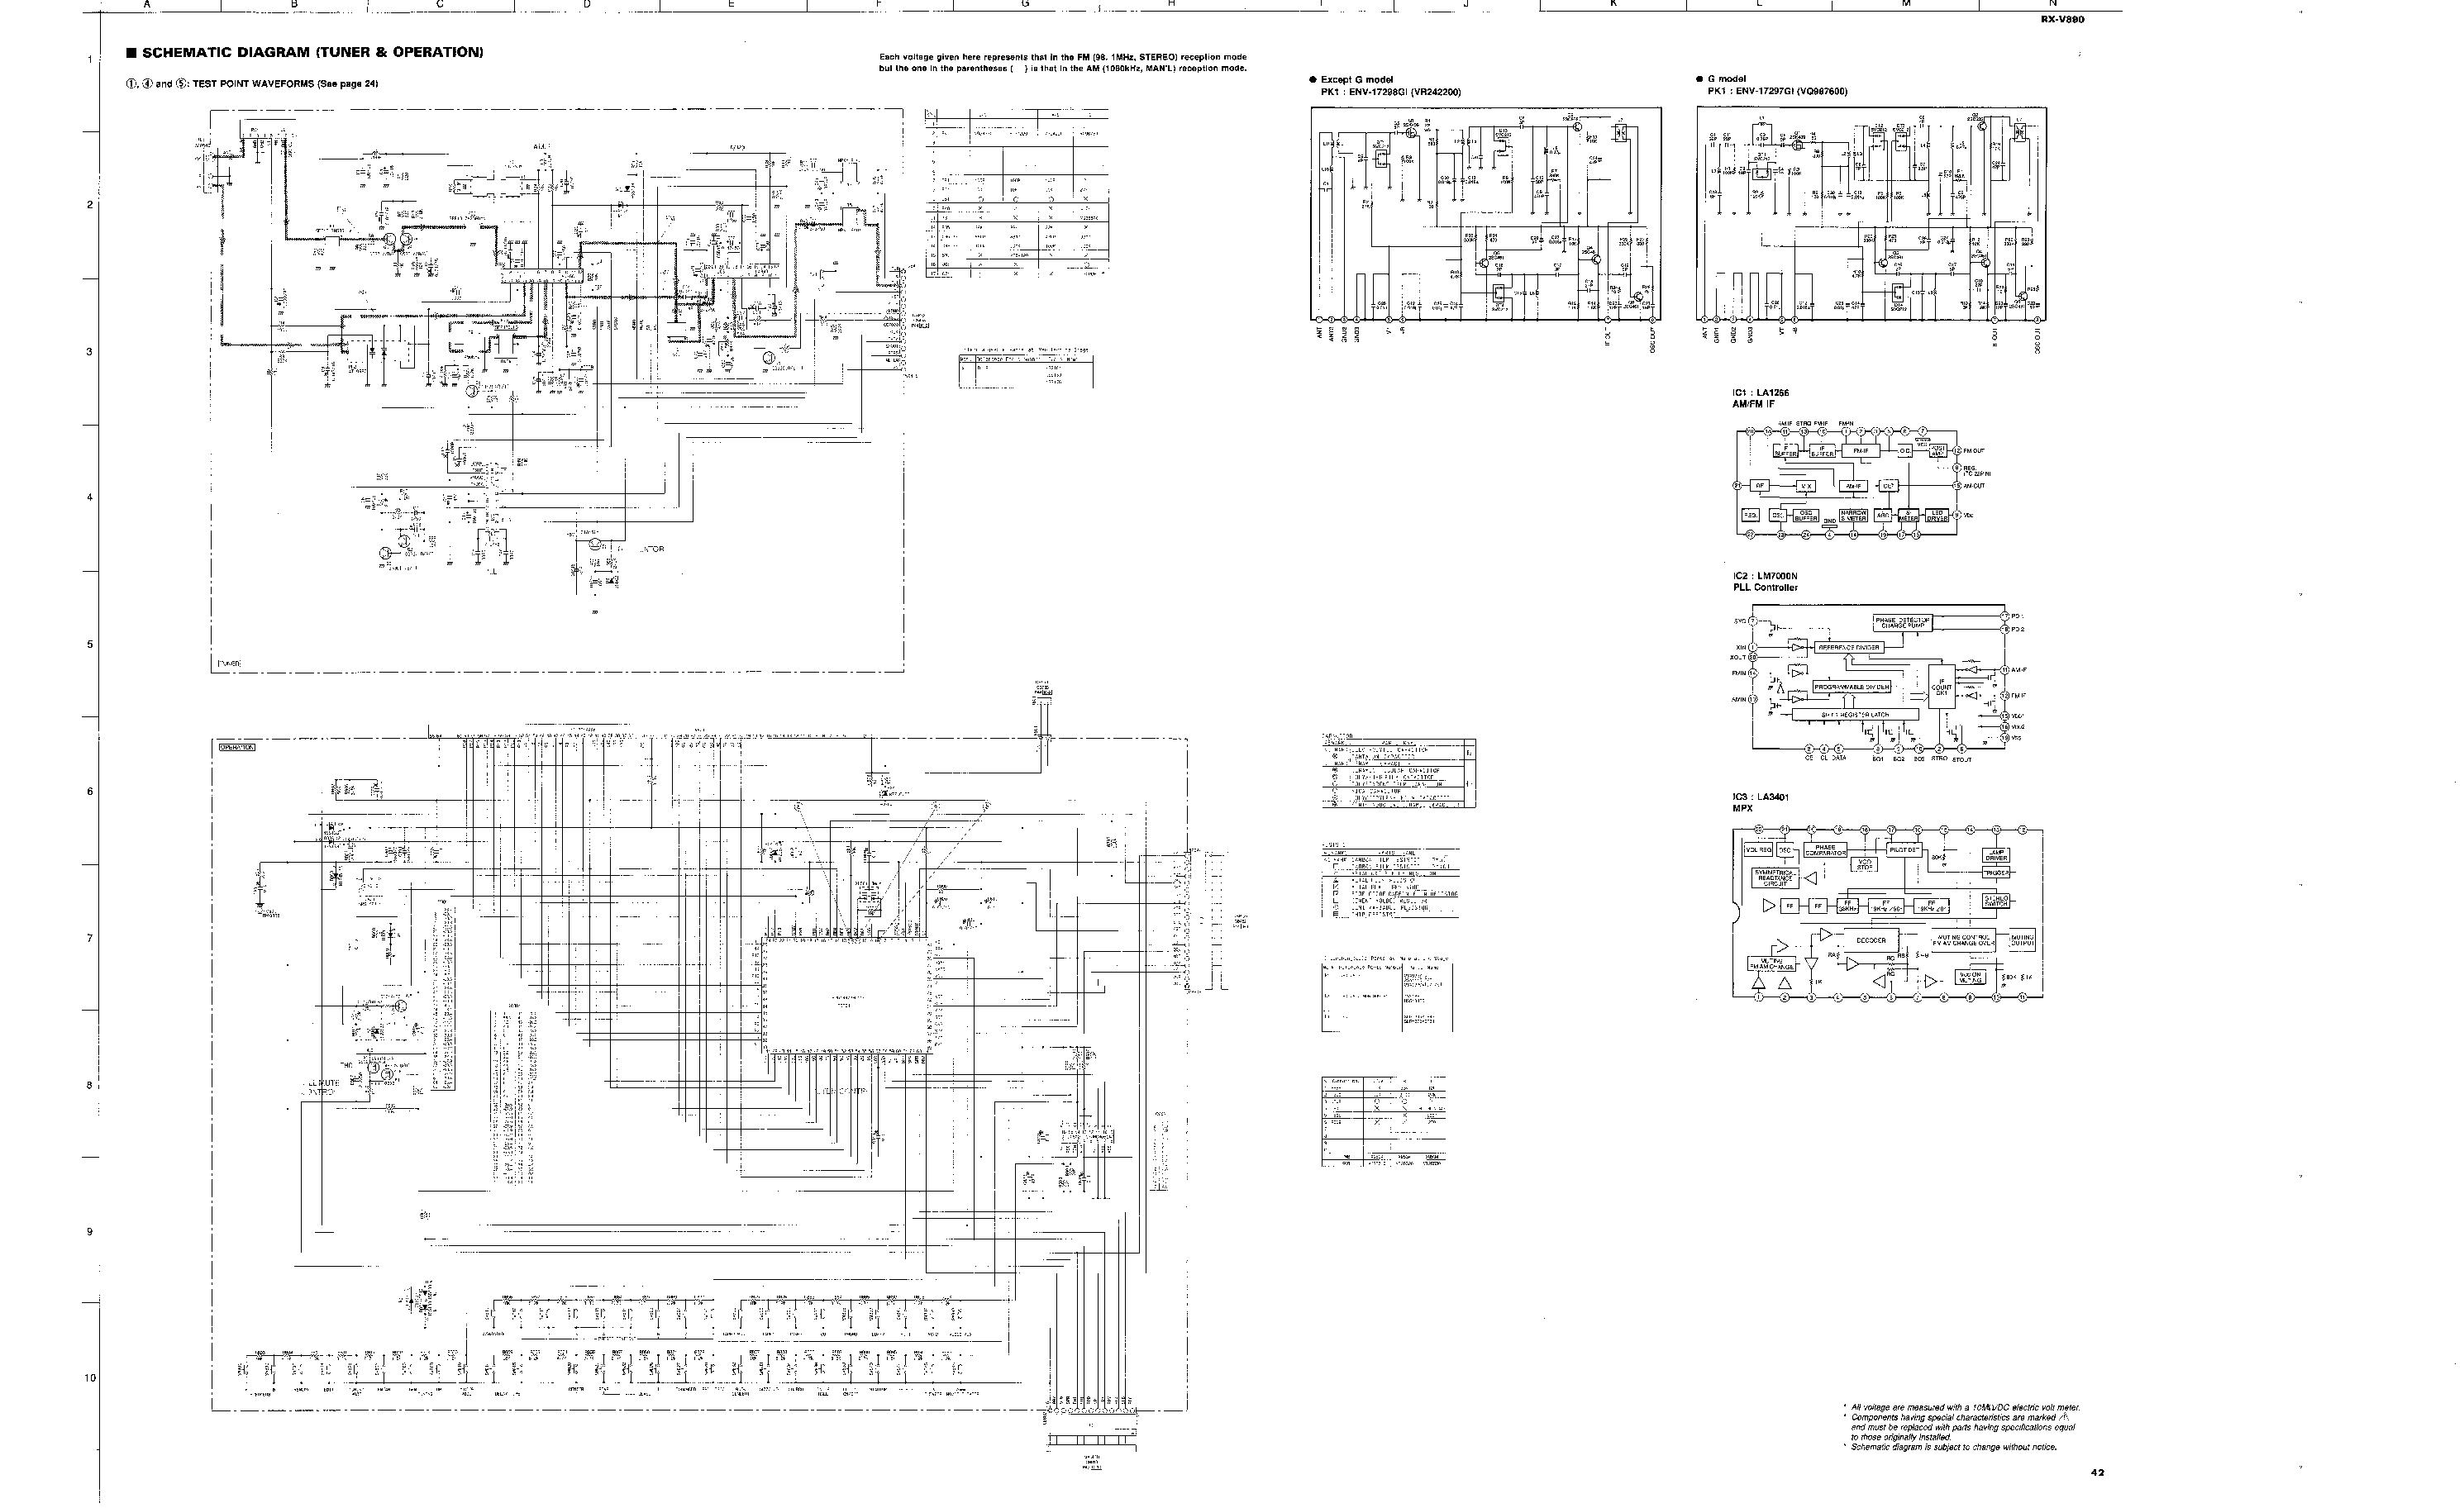 YAMAHA RX-V890 SCH Service Manual download, schematics